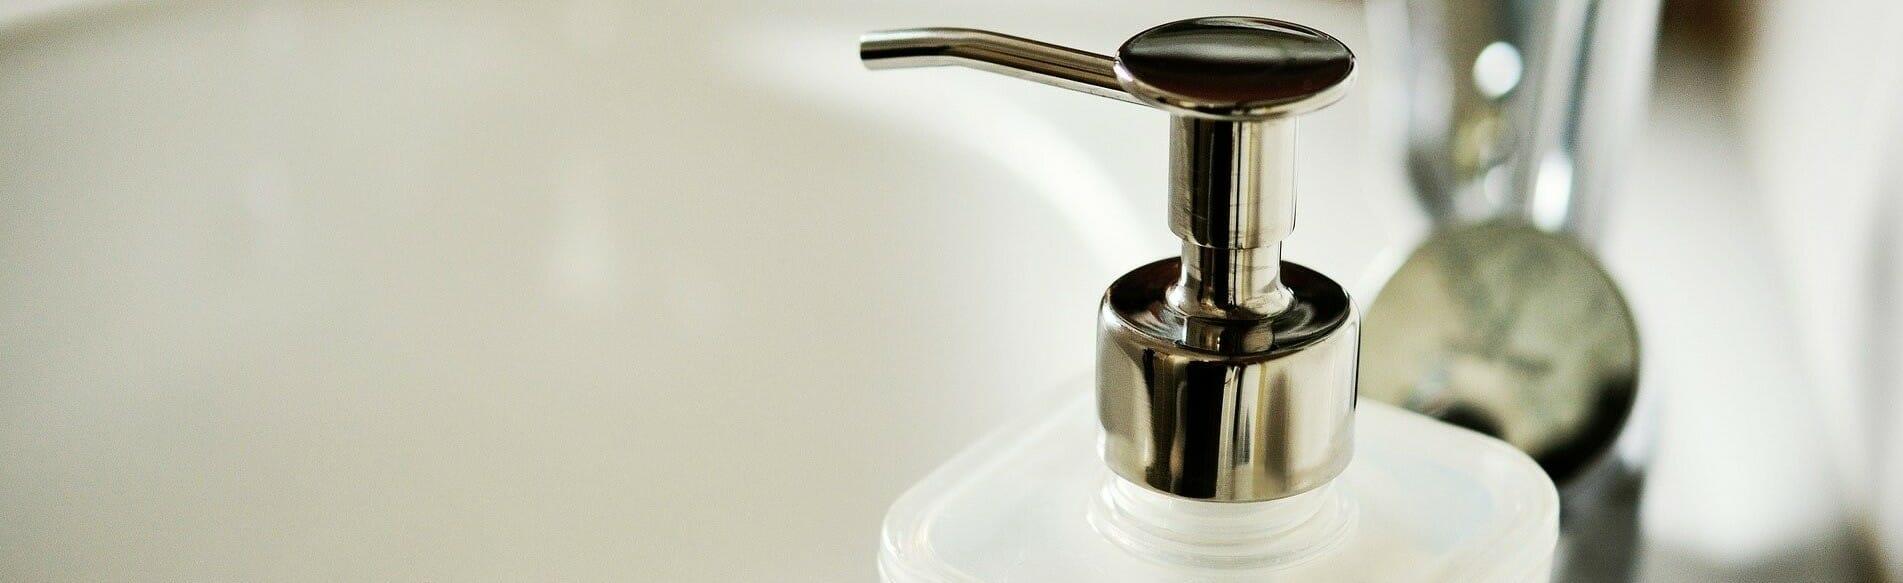 hygienekonzept acama hotel+hostel